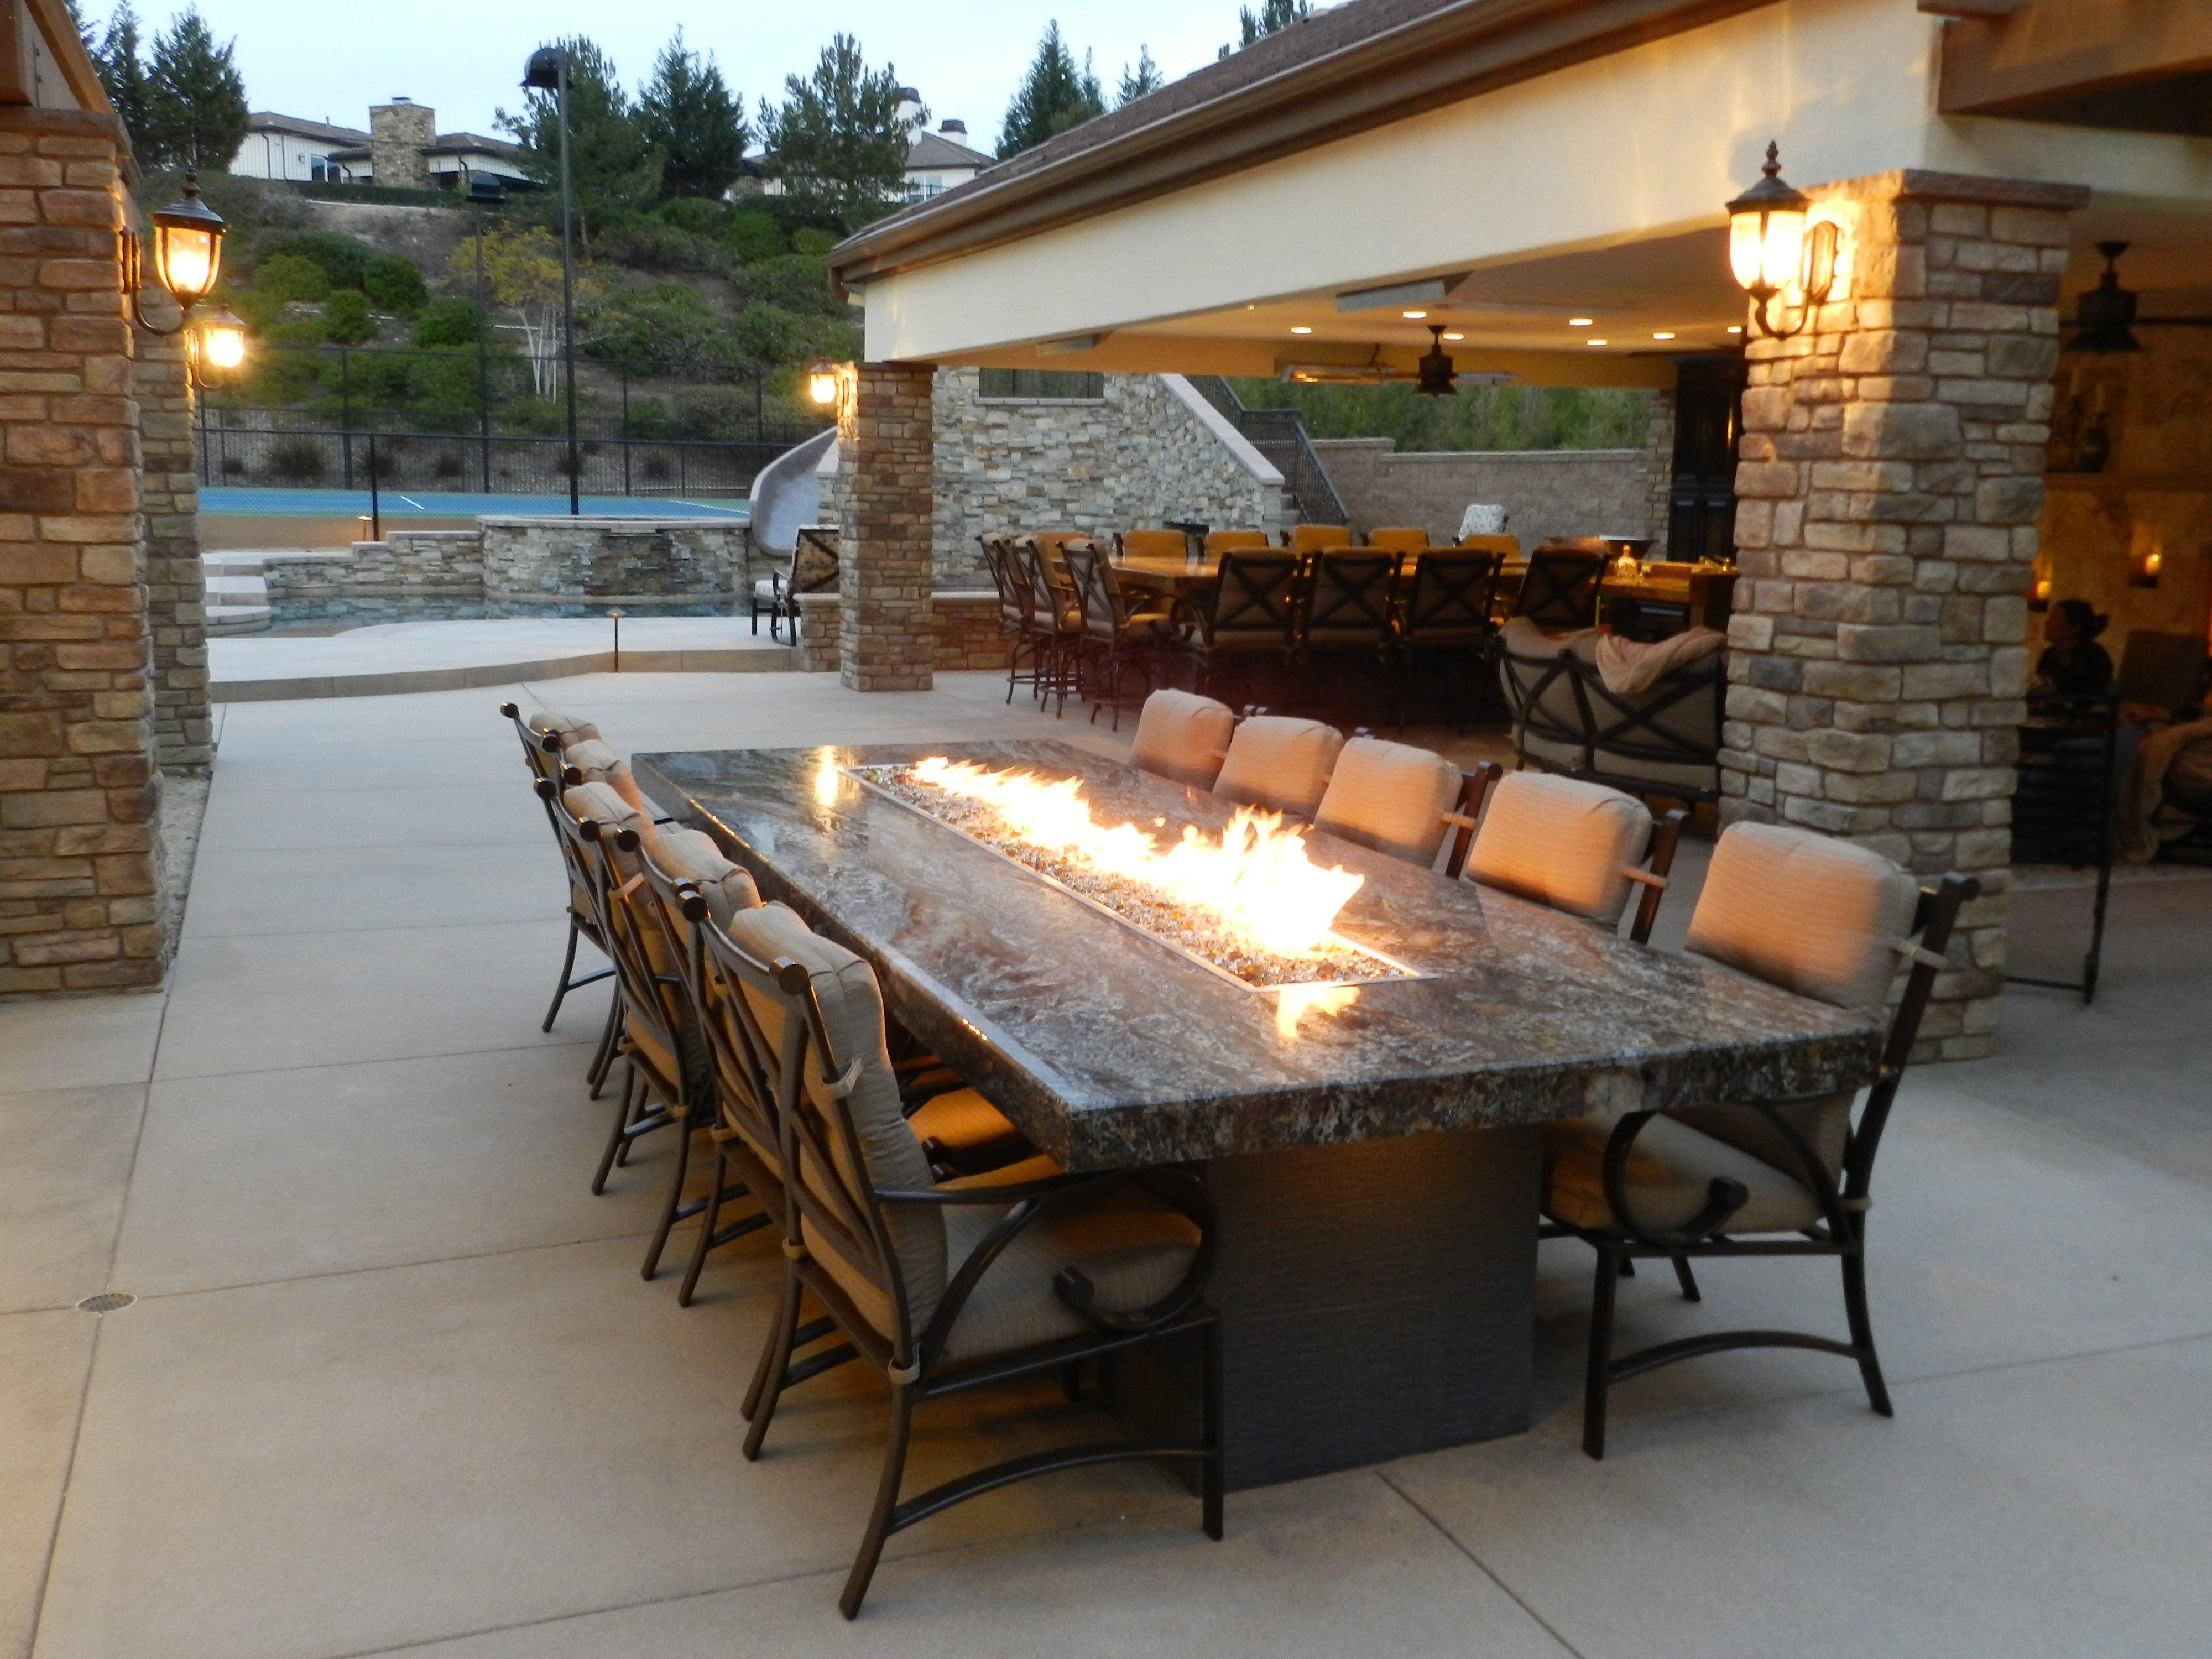 Awesome Outdoor  Custom Made {Fire Glass} Fire Table #fire #firebowl #backyard